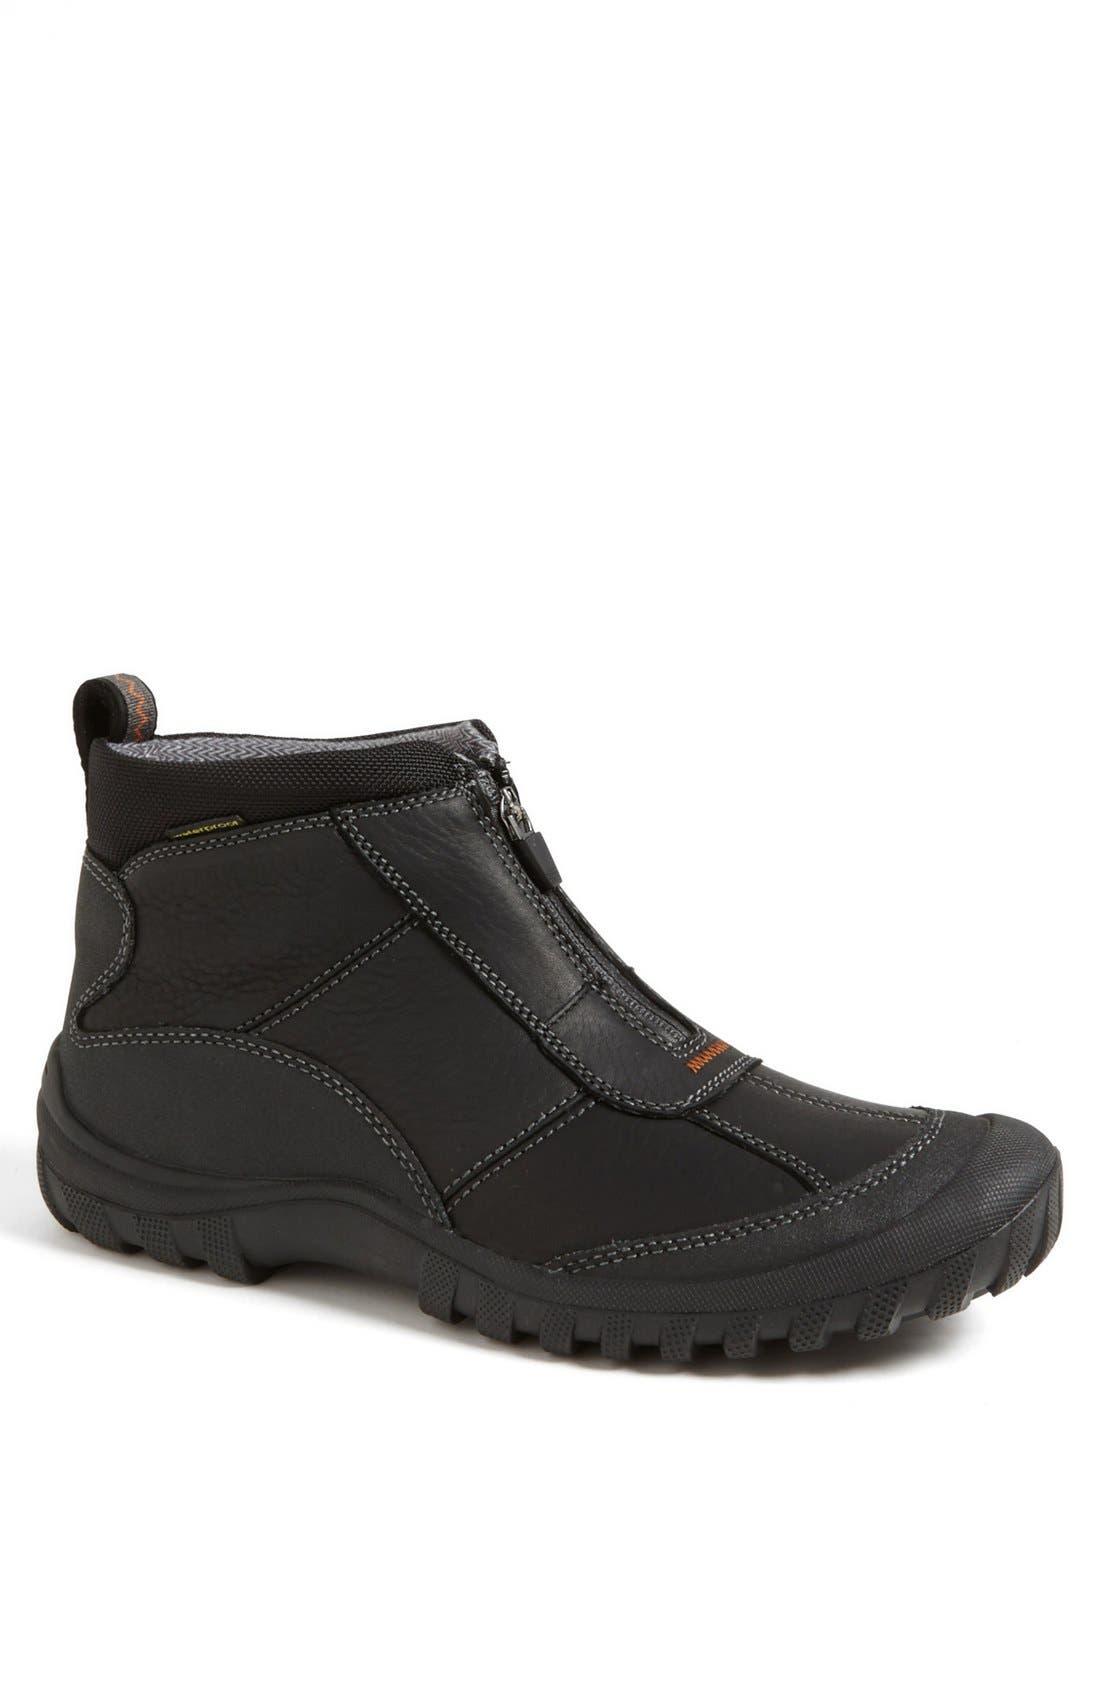 'Archeo' Zip Boot, Main, color, 003